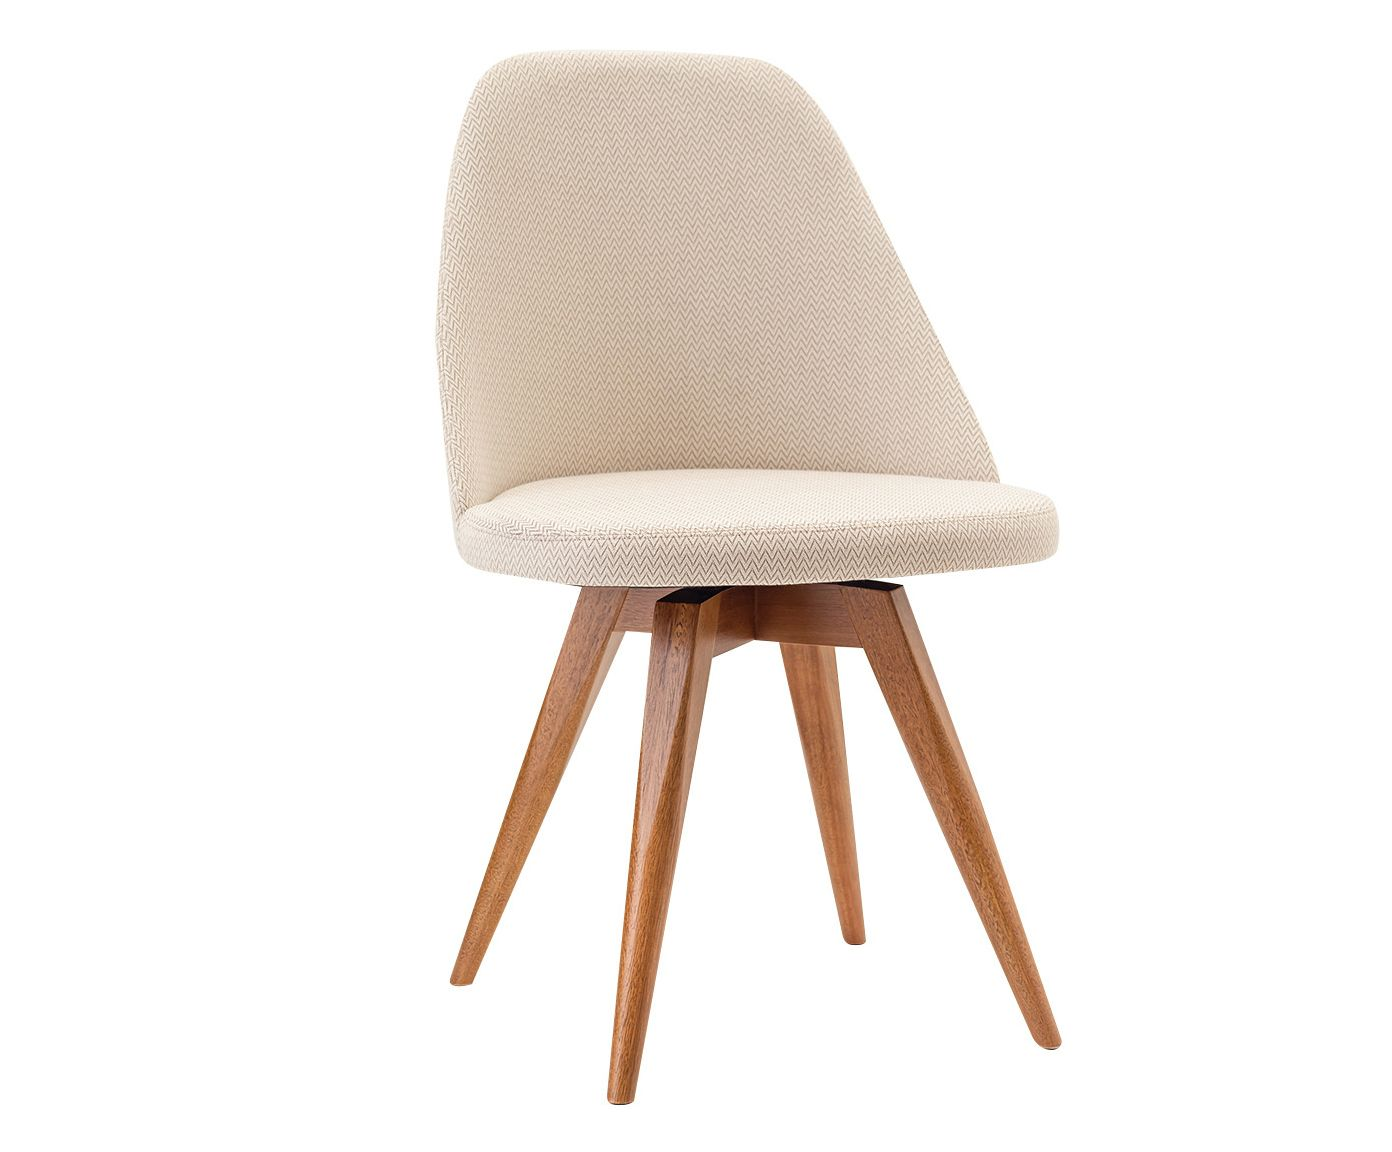 Cadeira Fixa Lucy Bege Claro - 53X86X55cm | Westwing.com.br